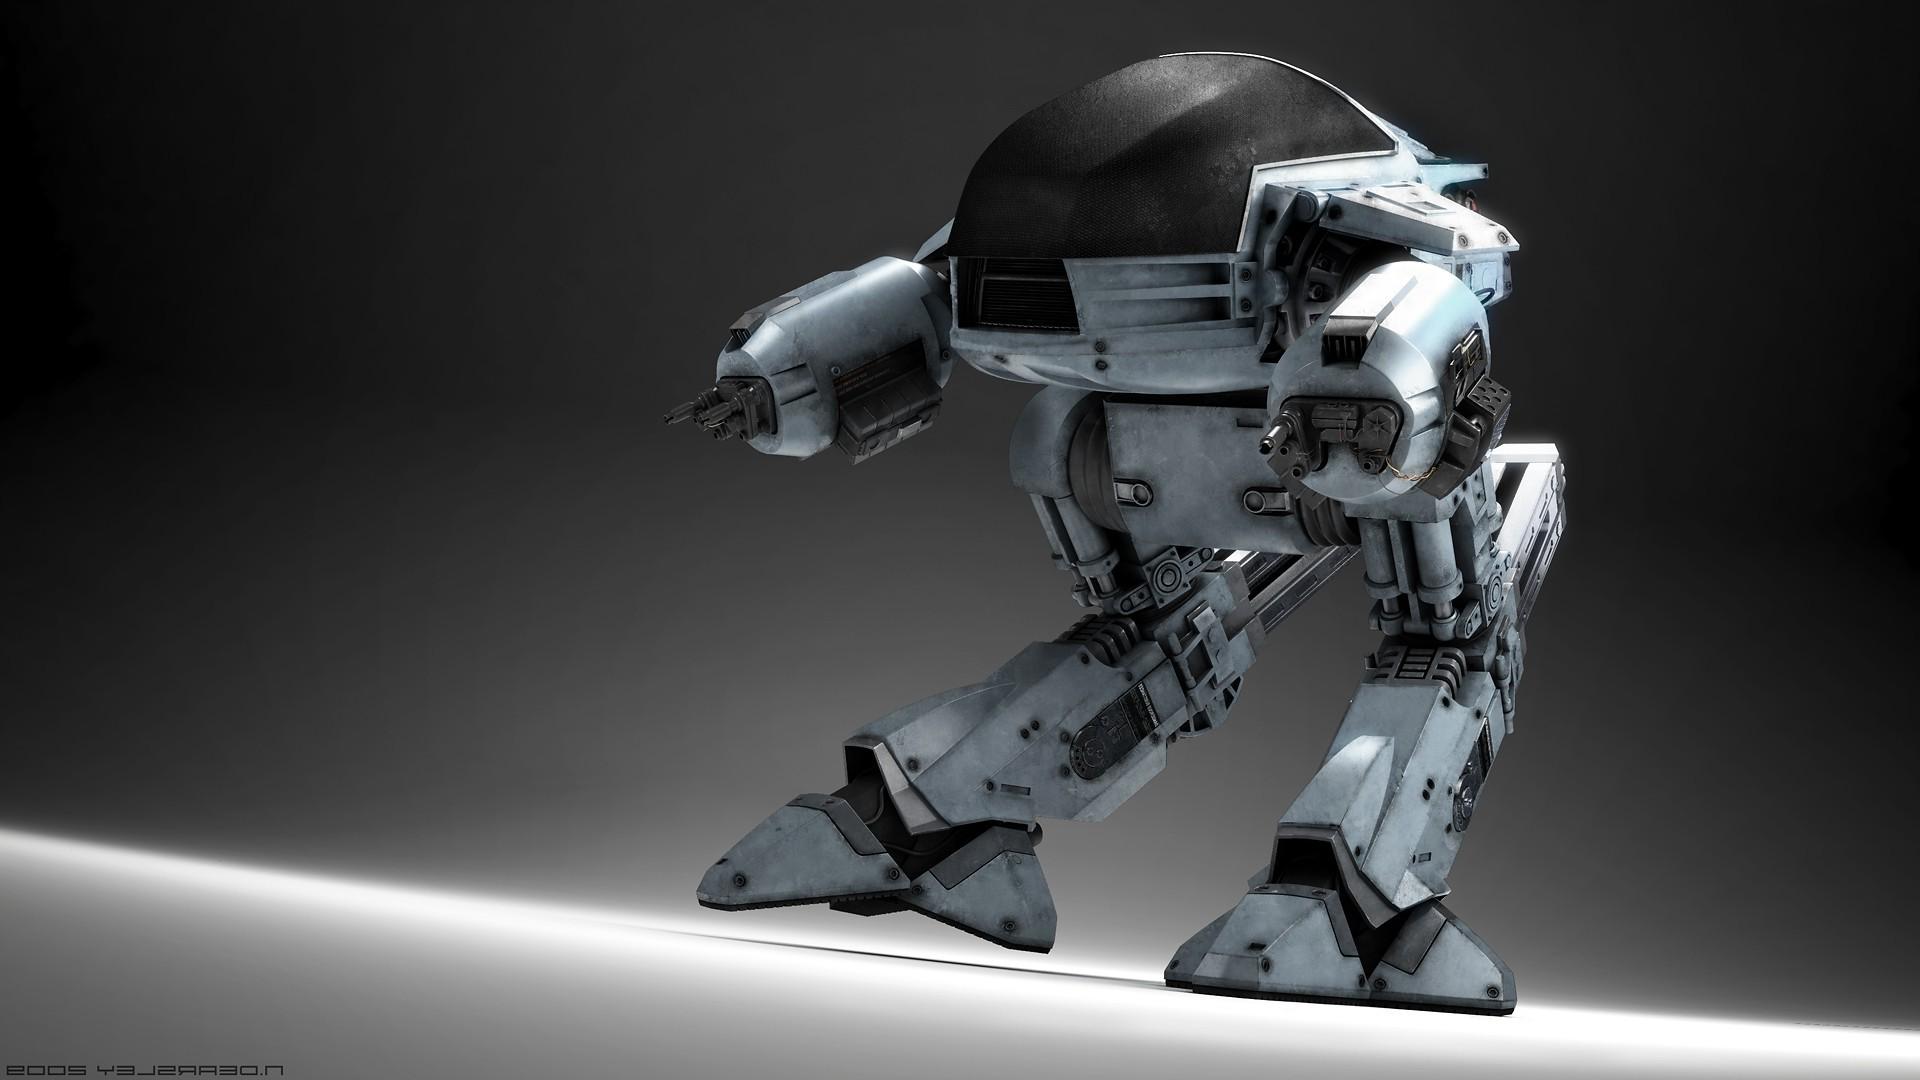 wallpaper : movies, toy, machine, robocop, ed 209, screenshot, mecha